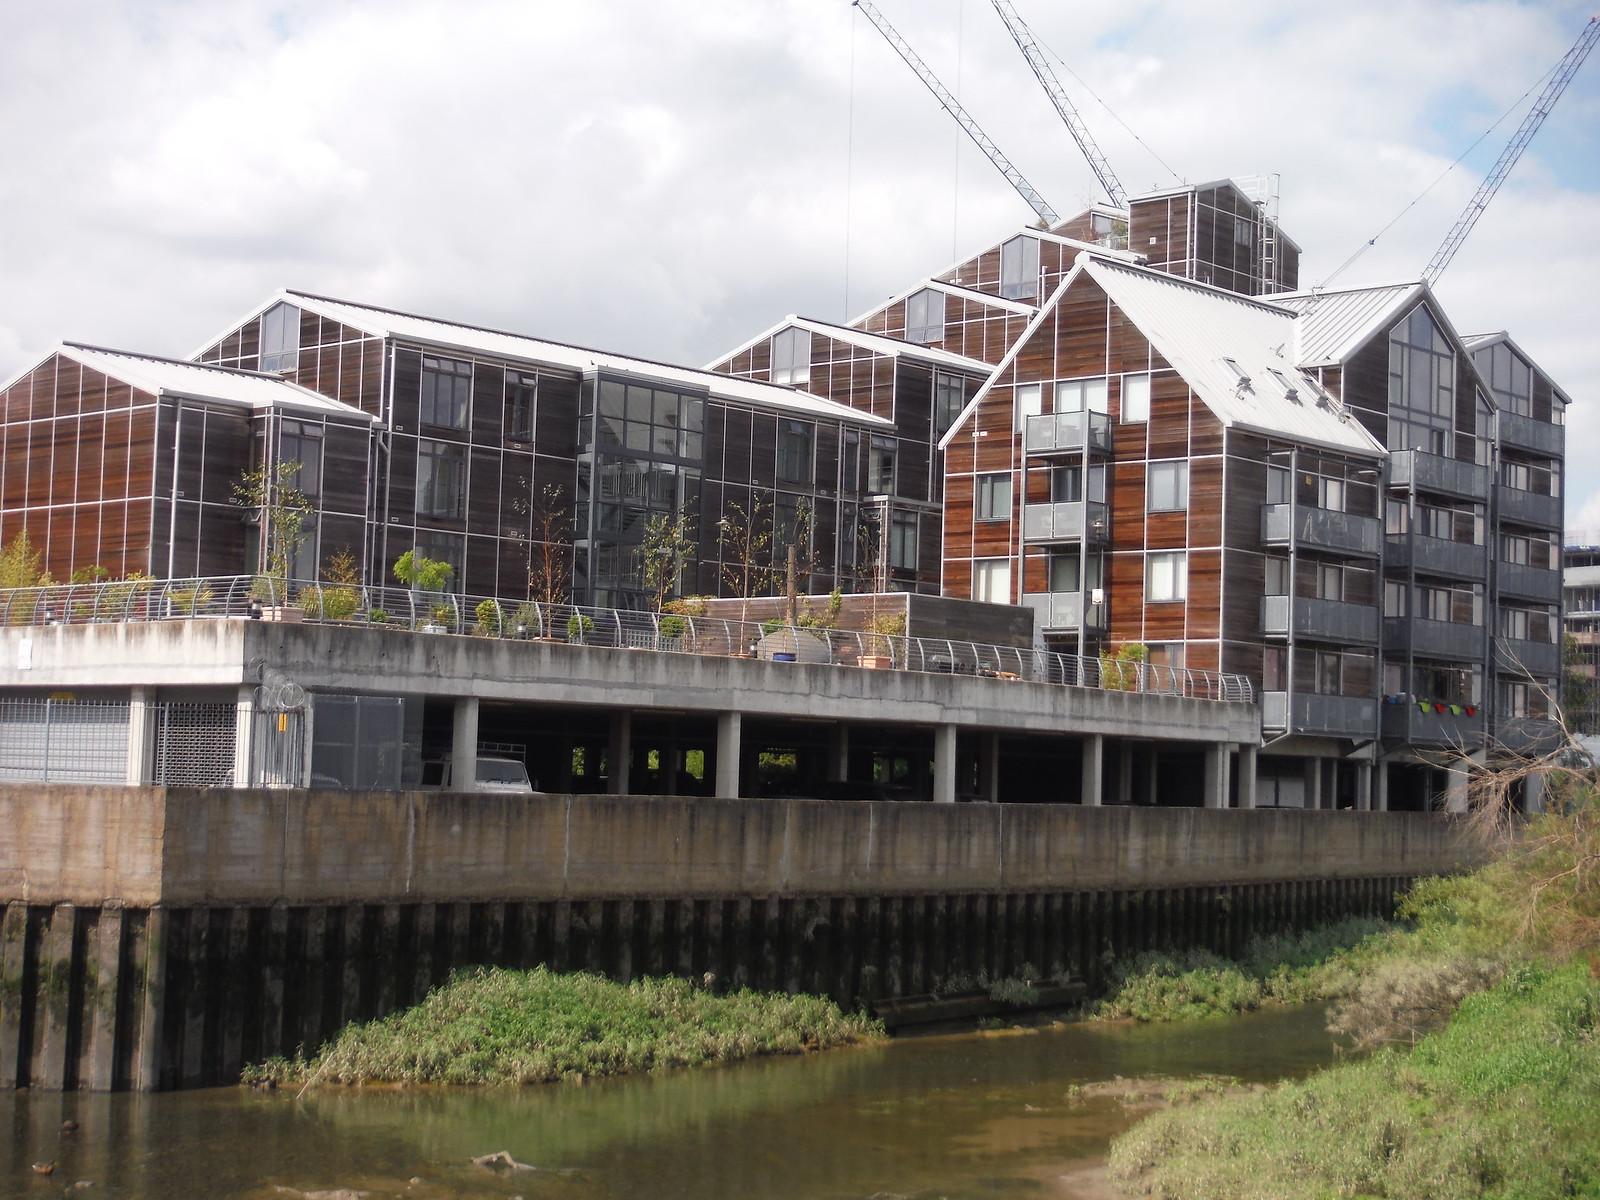 New Buildings near Three Mills SWC Short Walk 21 - The Line Modern Art Walk (Stratford to North Greenwich)